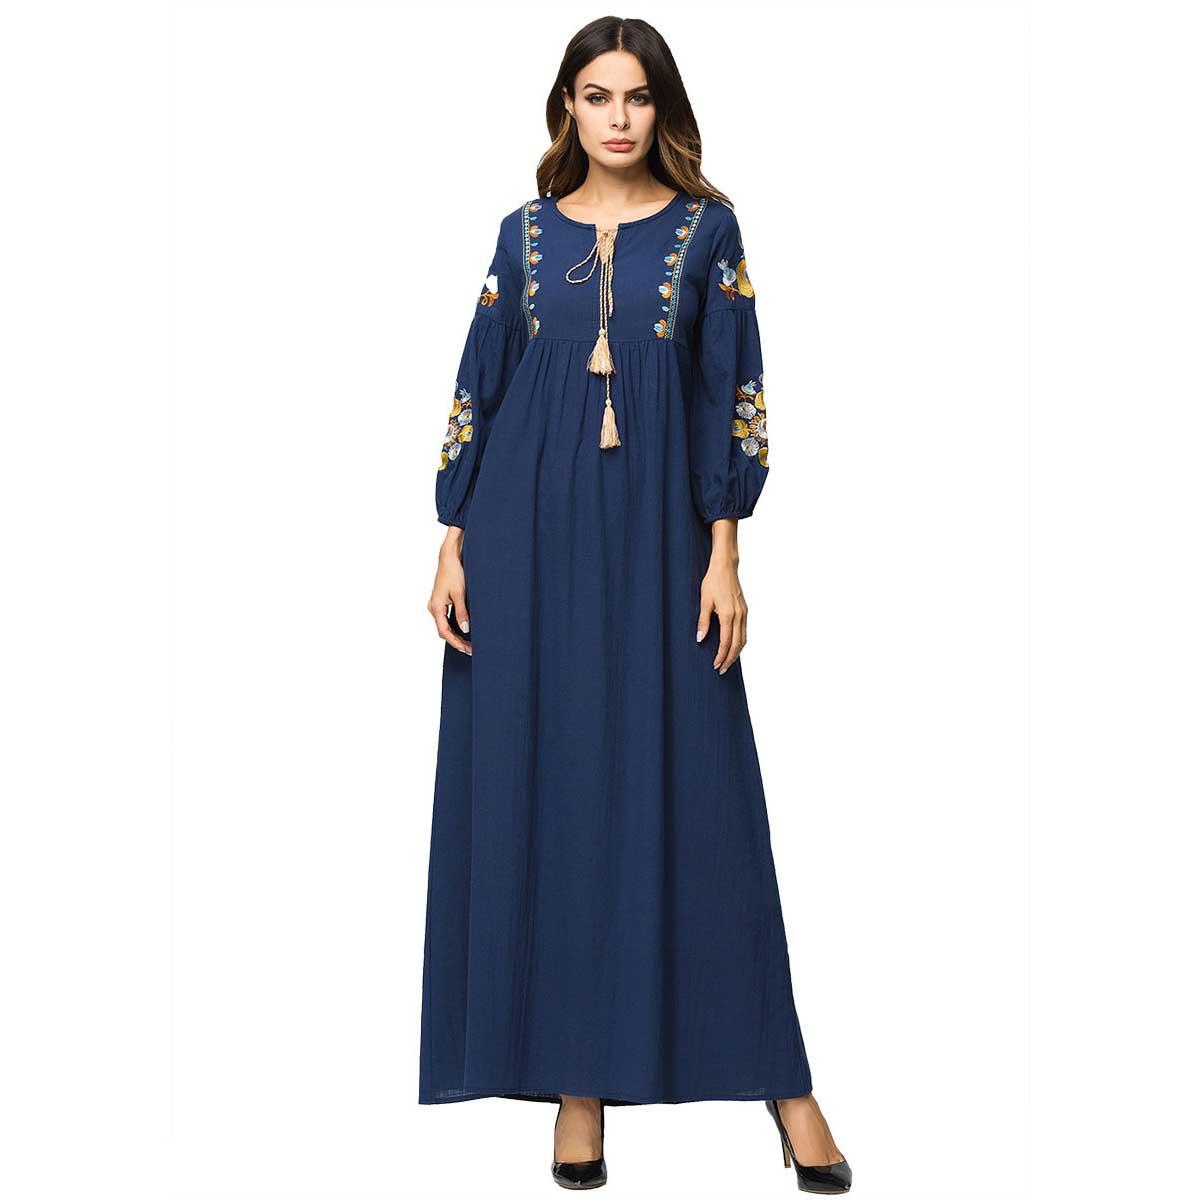 2019 Autumn Embroidery Ethnic Women Maxi Dress Patchwork Draped Dress Long Sleeve Tassel Vestidos De Fiesta Casual Wear VKDR1654